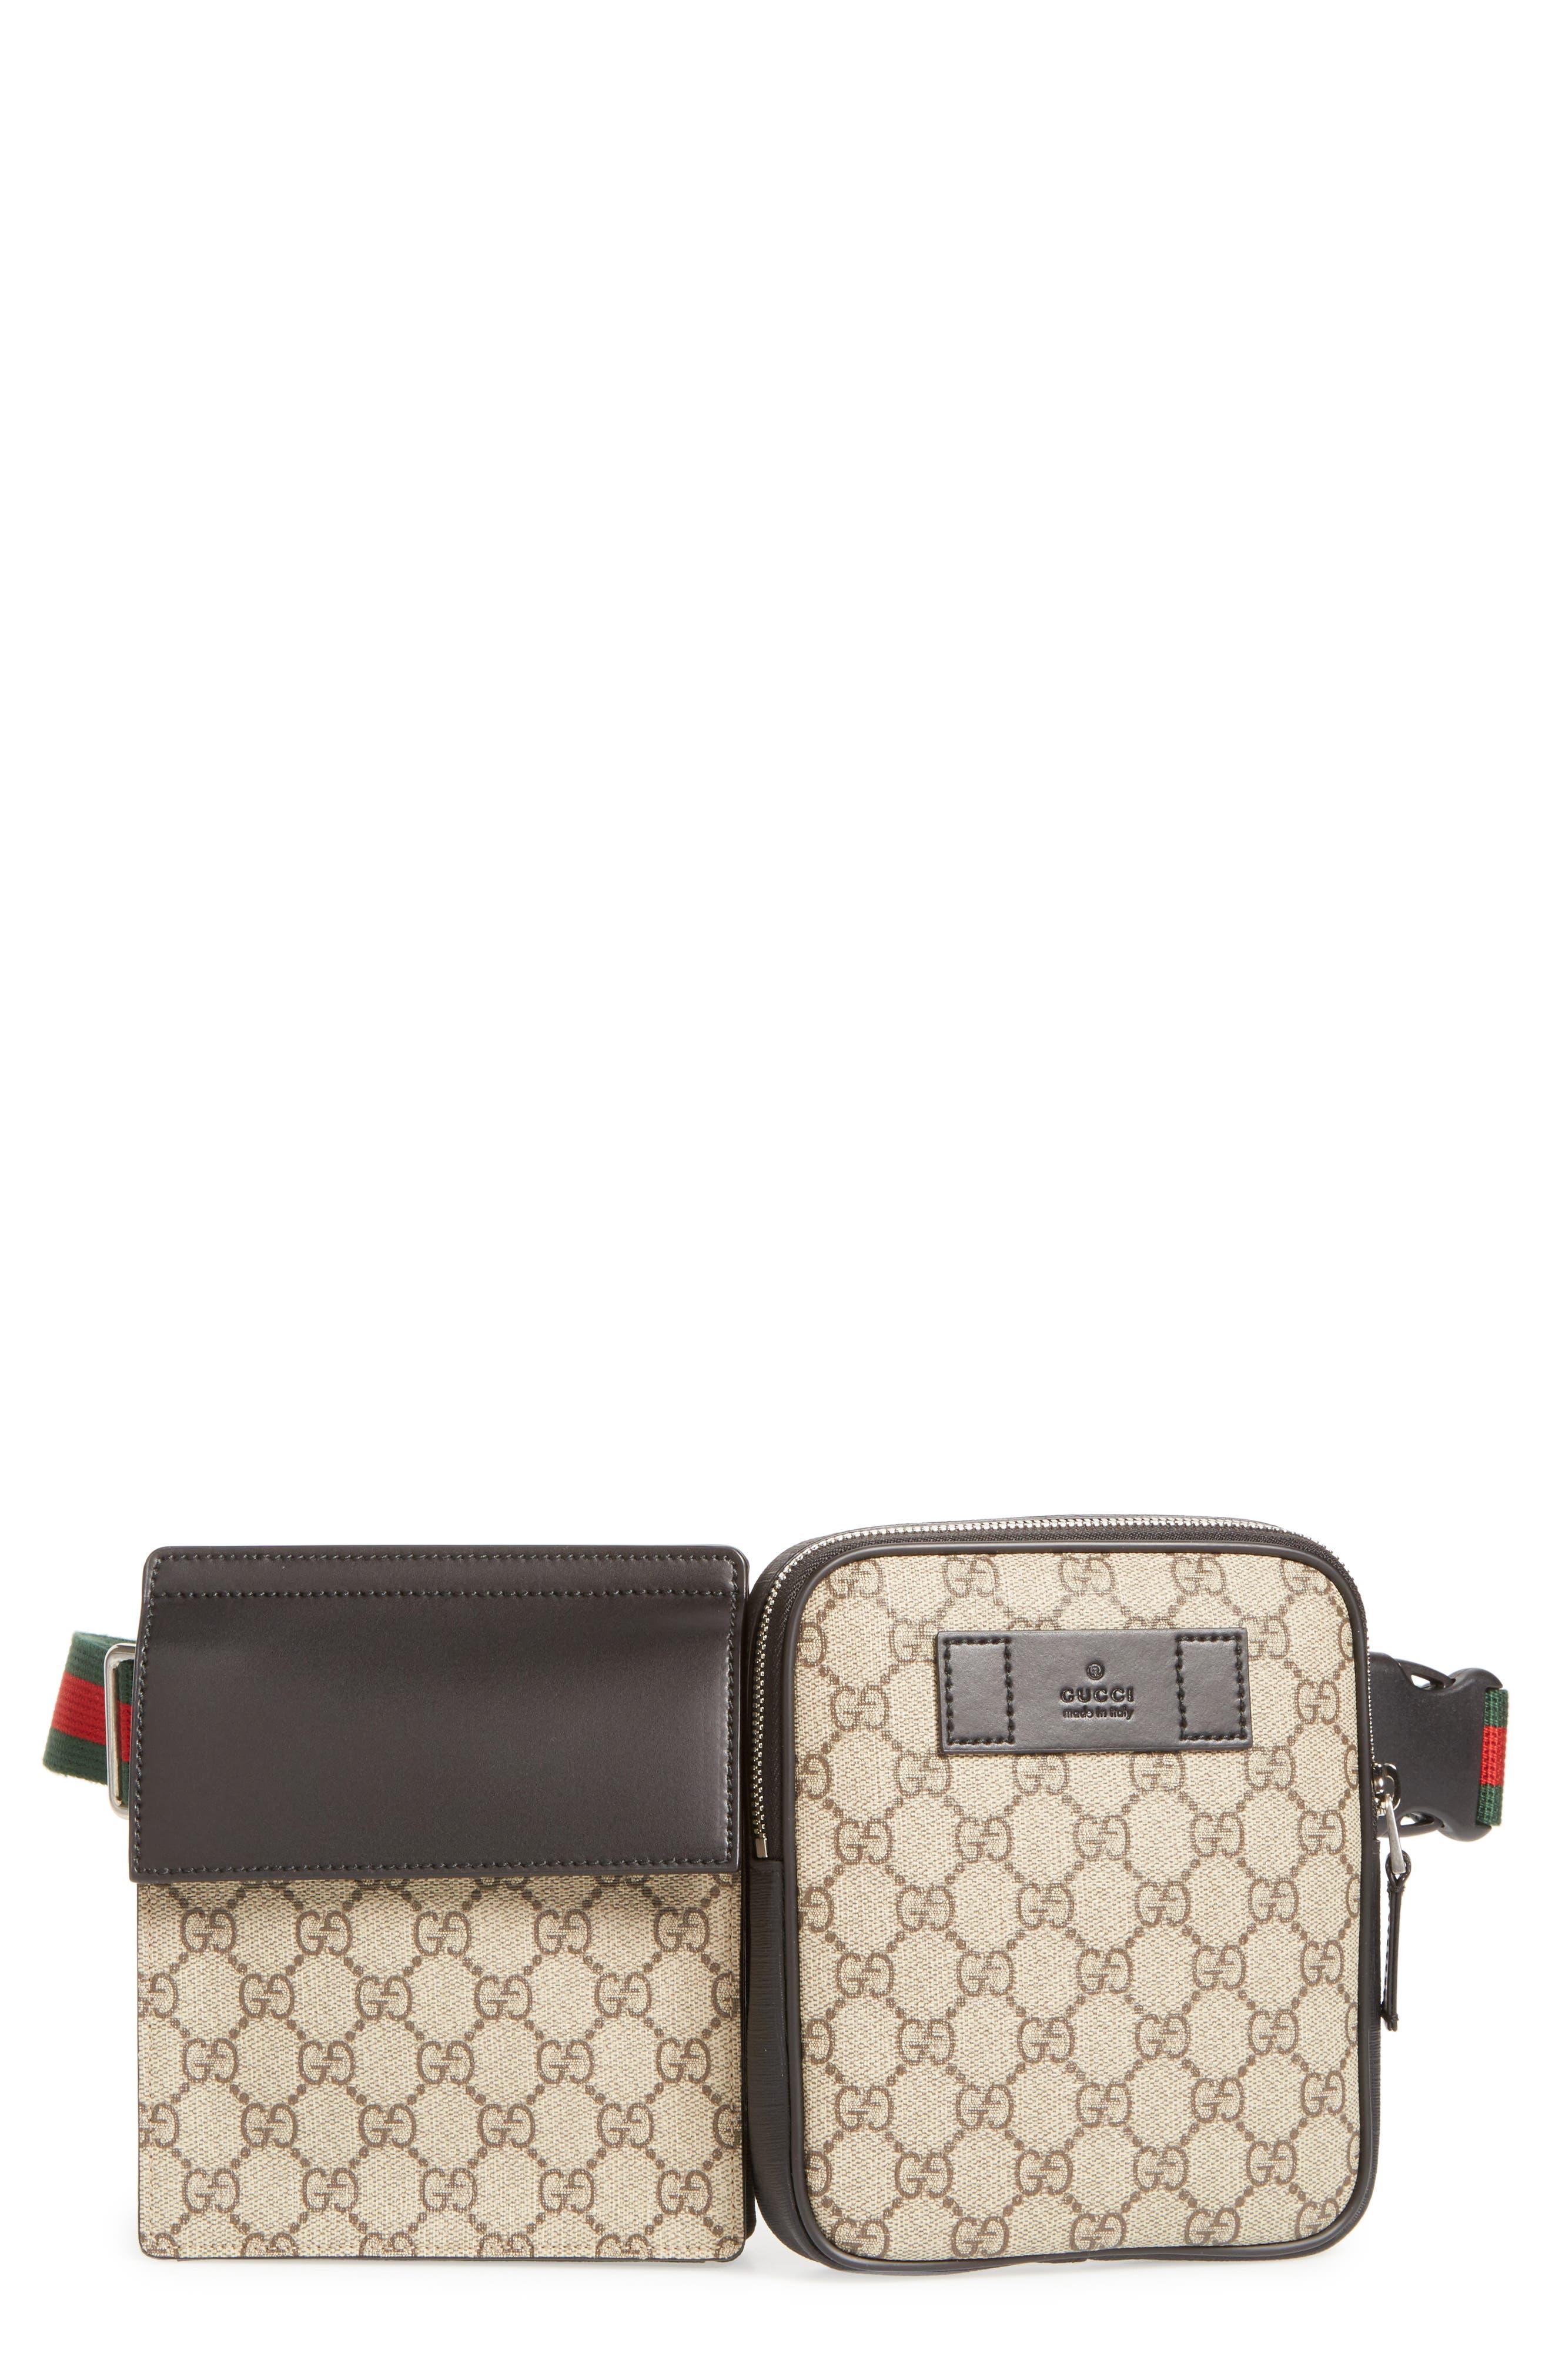 Main Image - Gucci Band Belt Bag